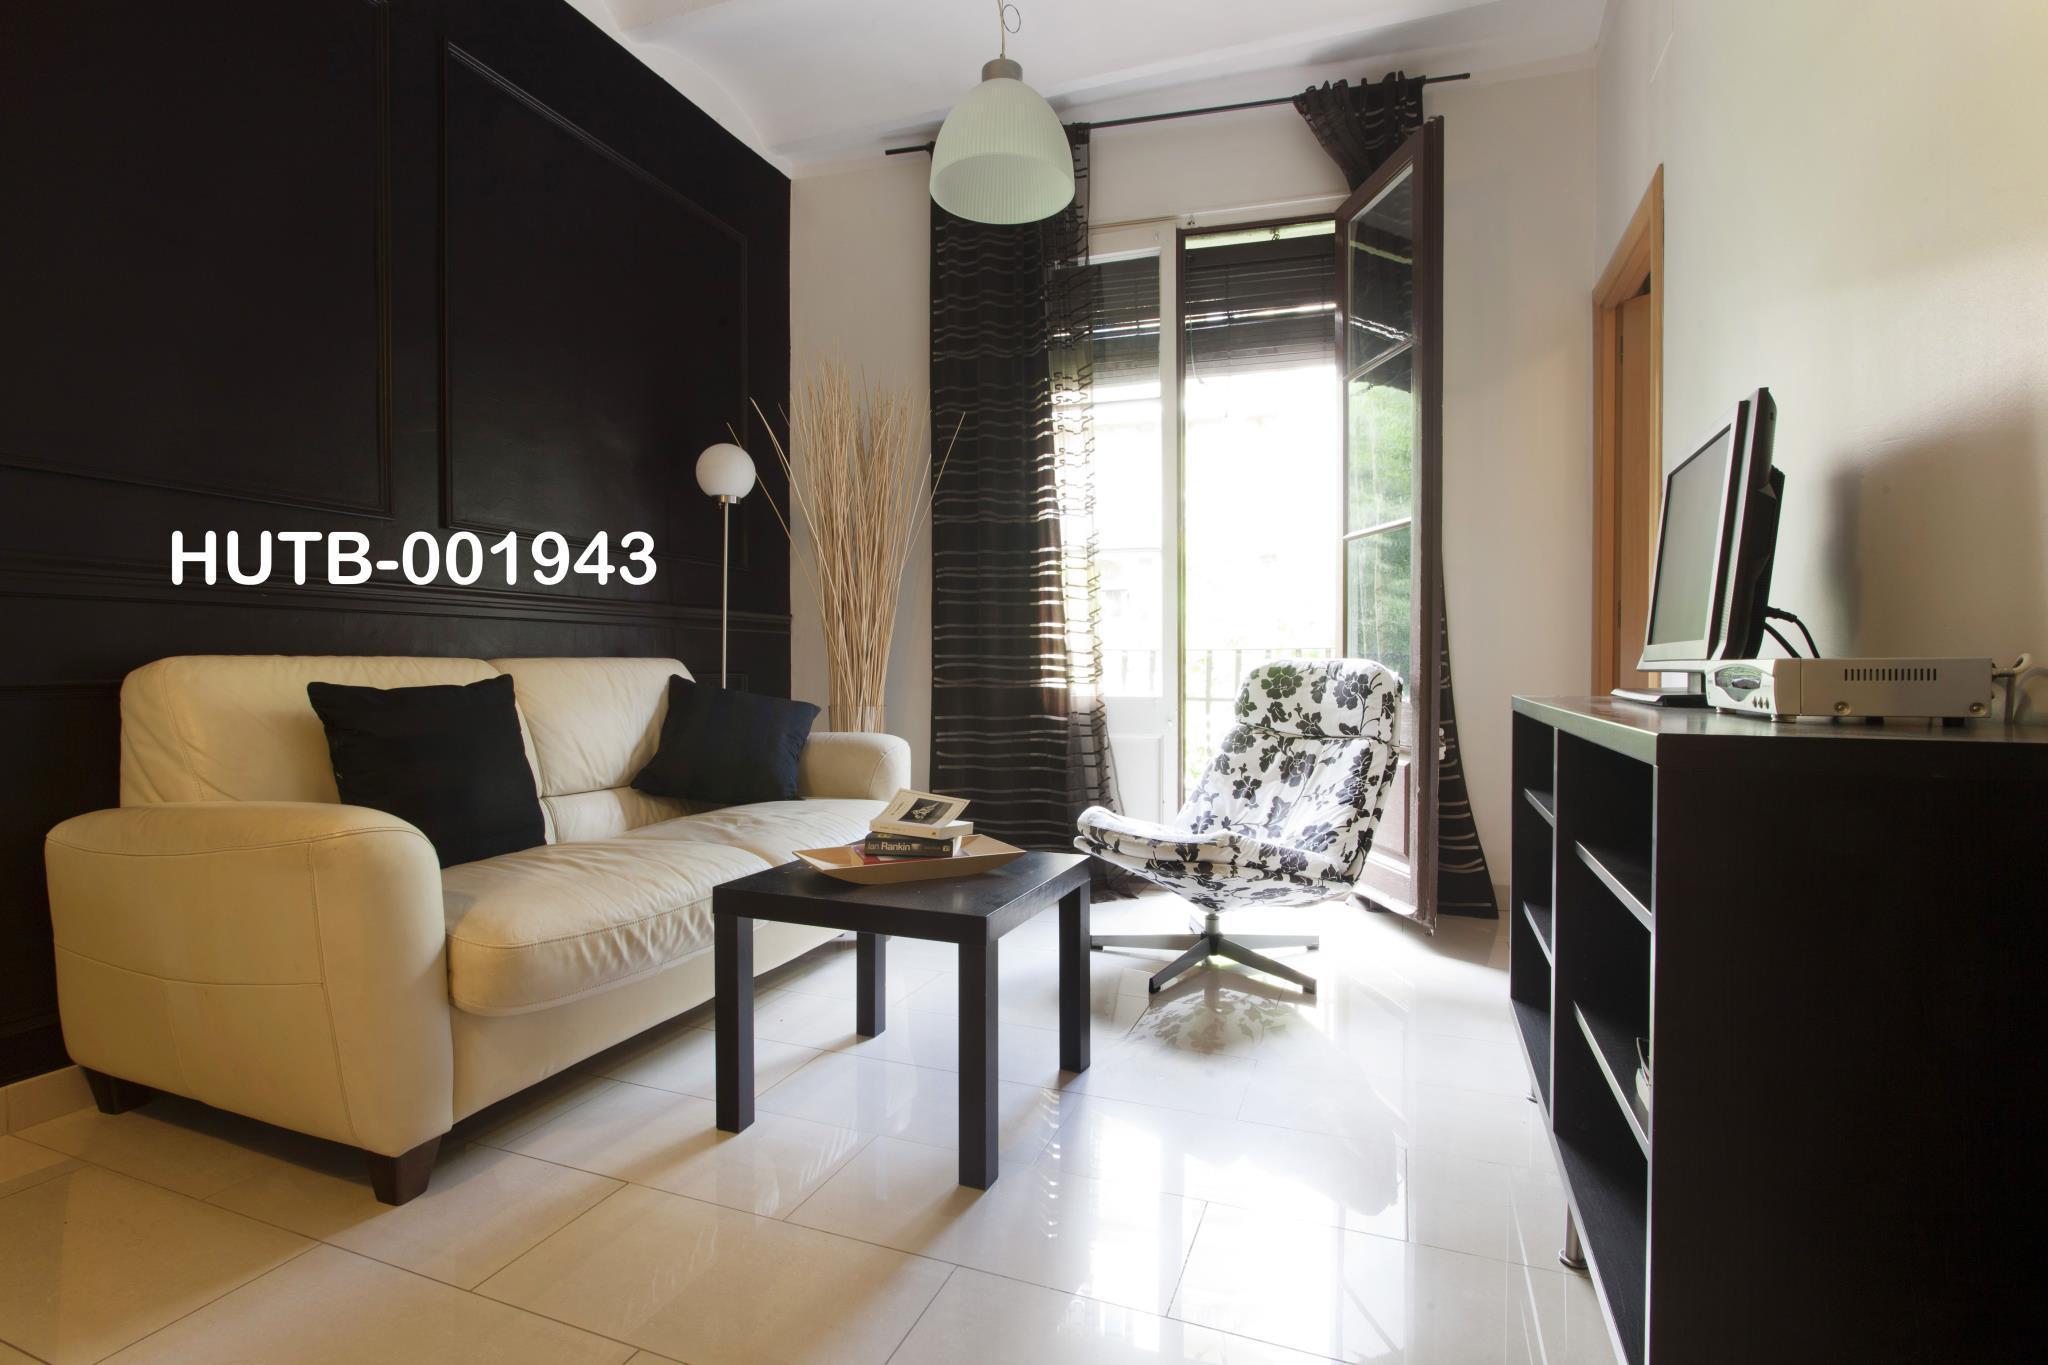 Fira de Barcelona 2 - Two Bedroom Apartment